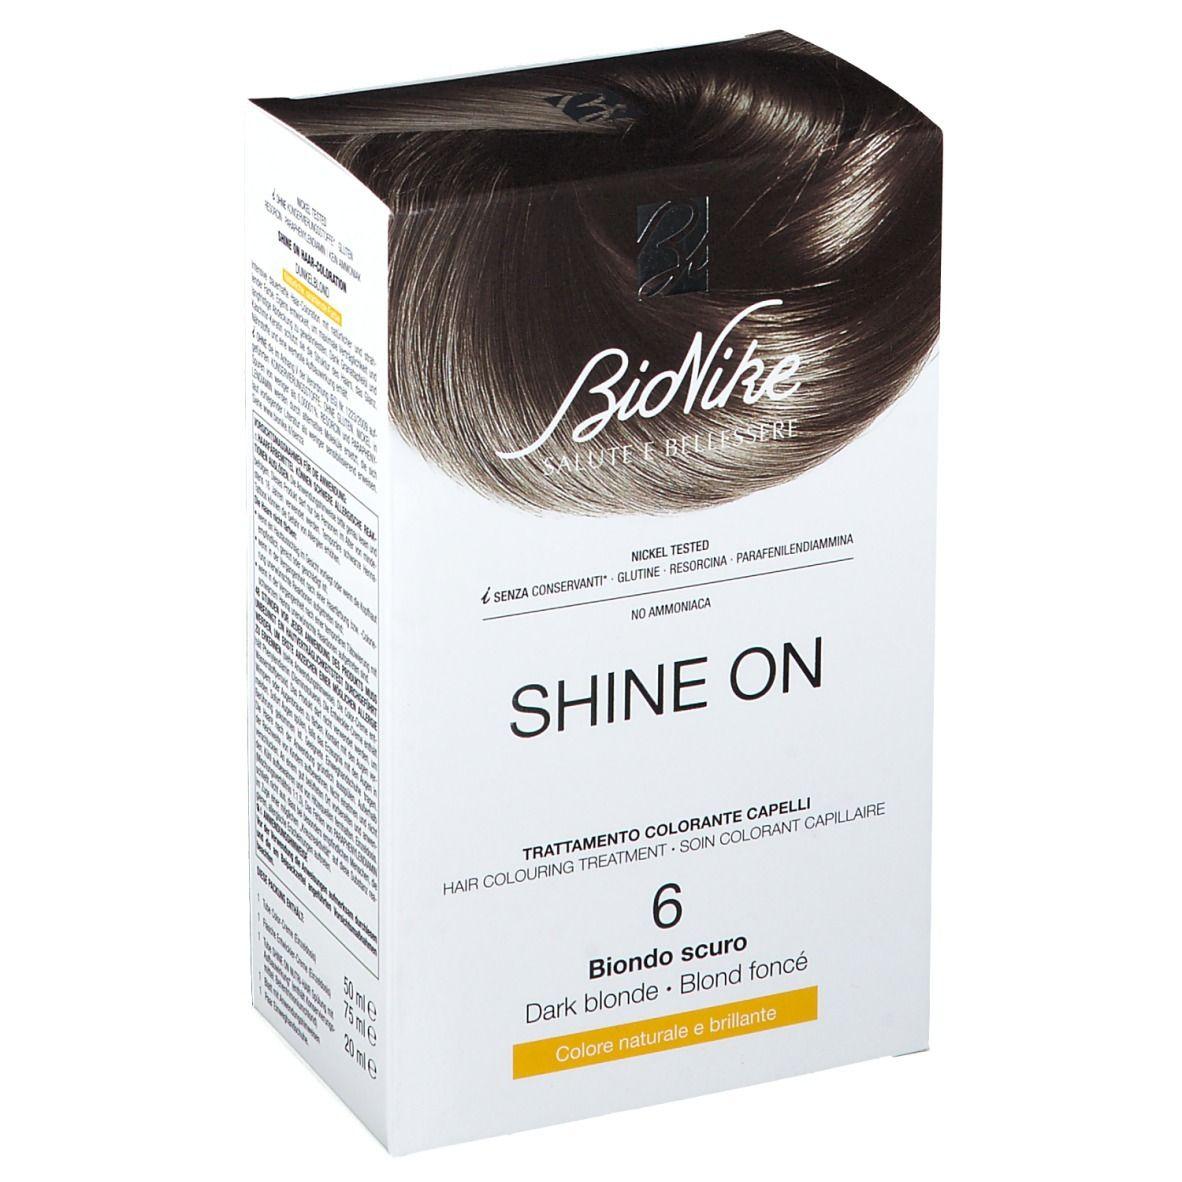 BioNike SHINE ON Soin colorant capillaire 6 Blond foncé pc(s) lotion(s)